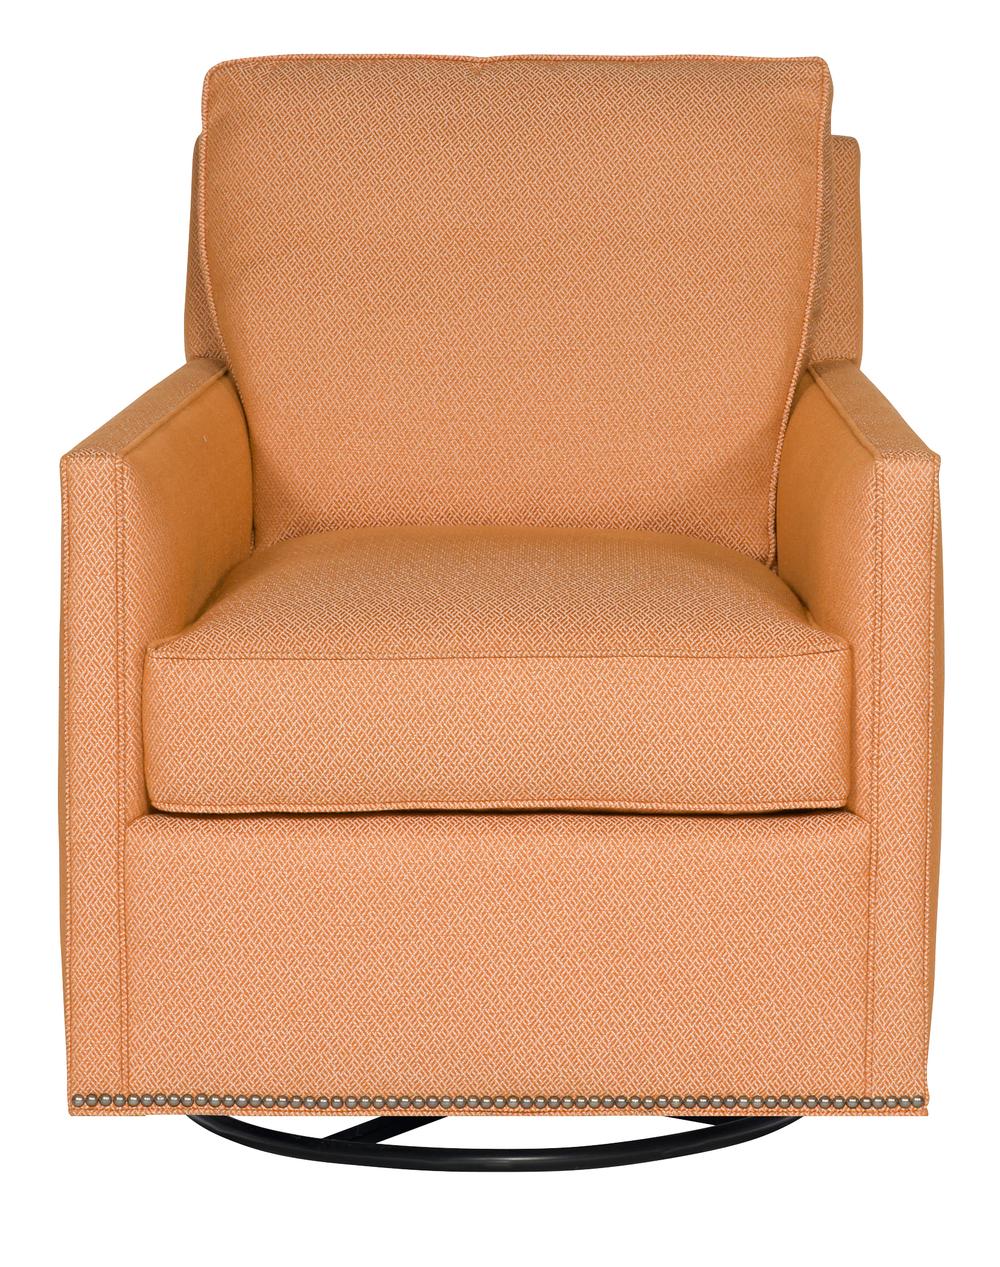 Vanguard Furniture - Katie Swivel Glider